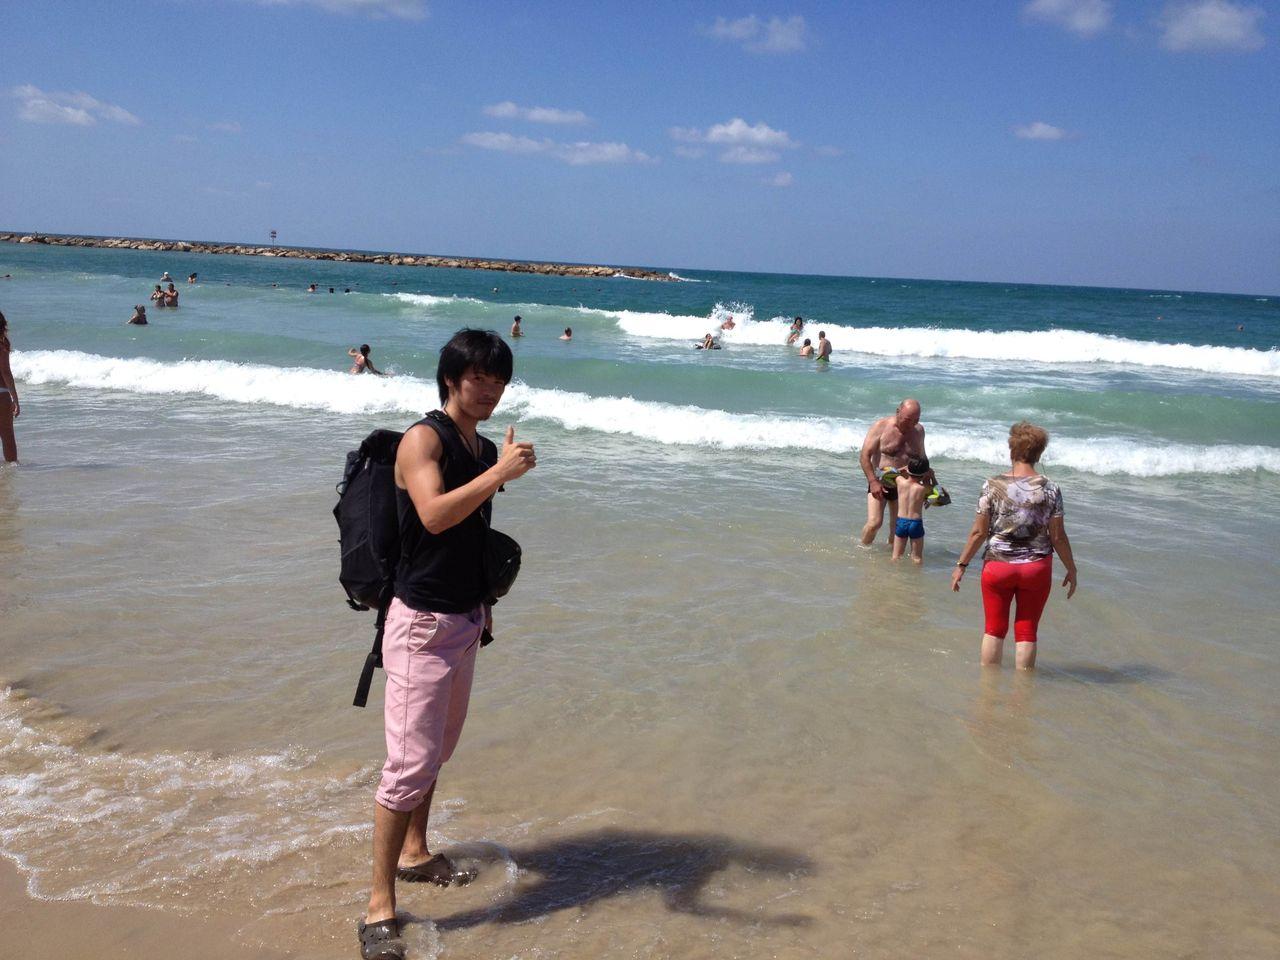 numajiri_atsushiのblog   テルアビブ観光 コメント